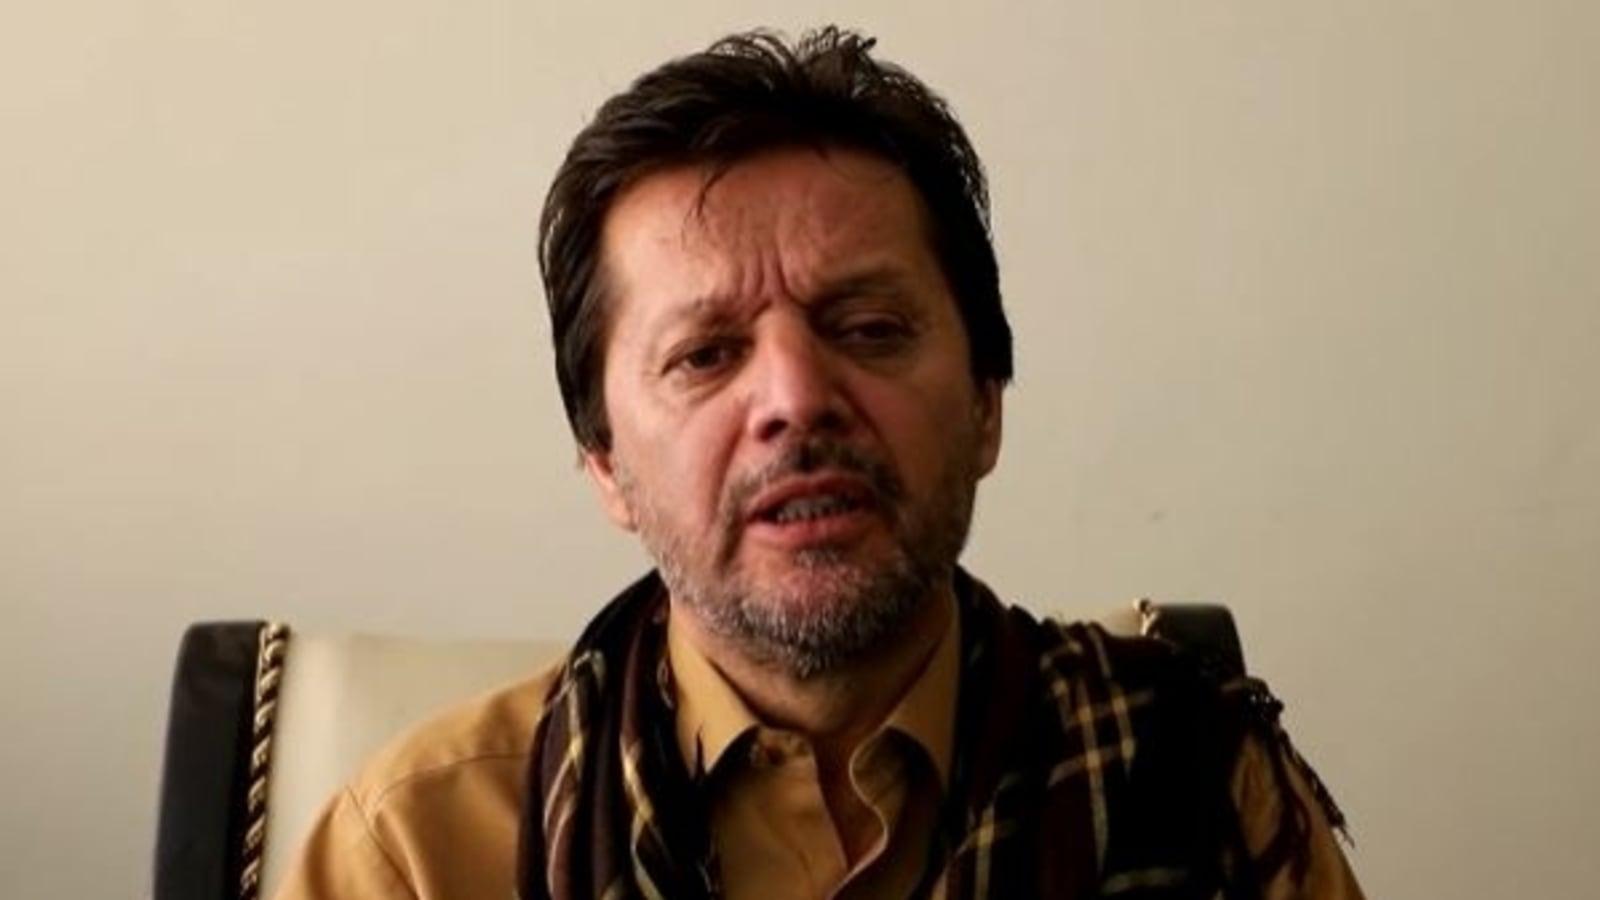 Afghanistan resistance front spokesperson killed in Panjshir: Reports